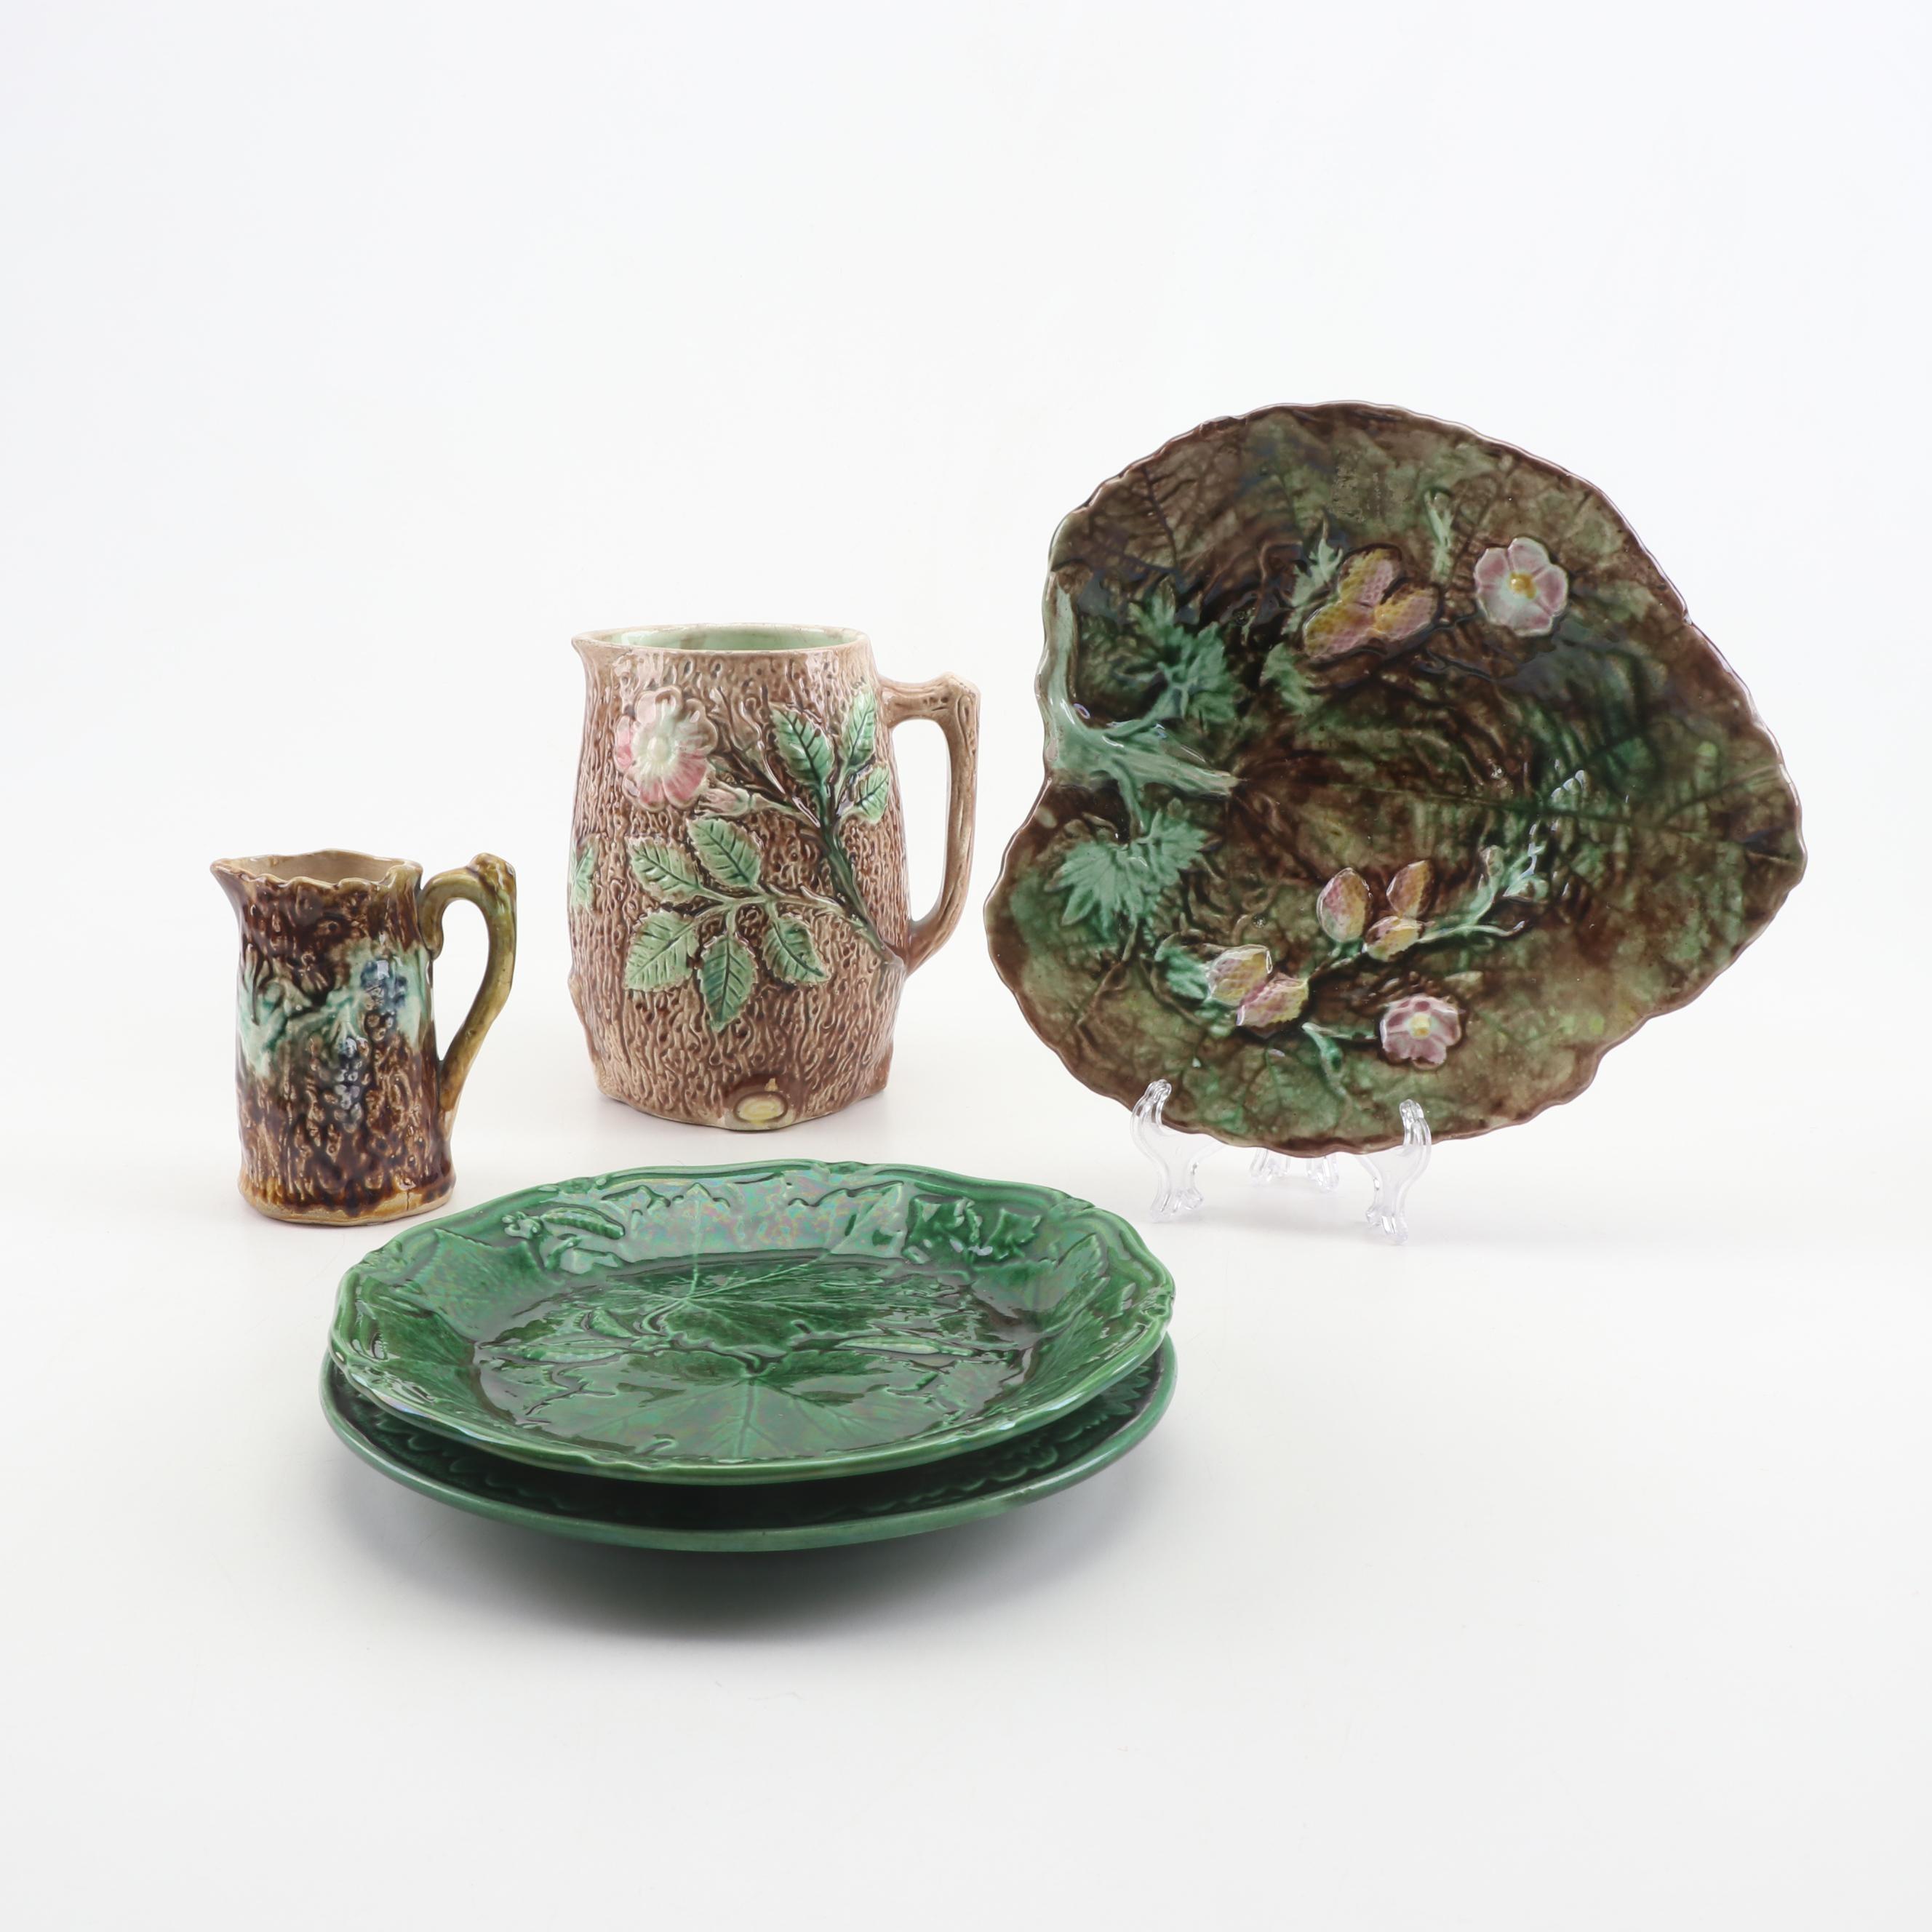 Majolica Dinnerware and Serveware, Early to Mid 20th Century